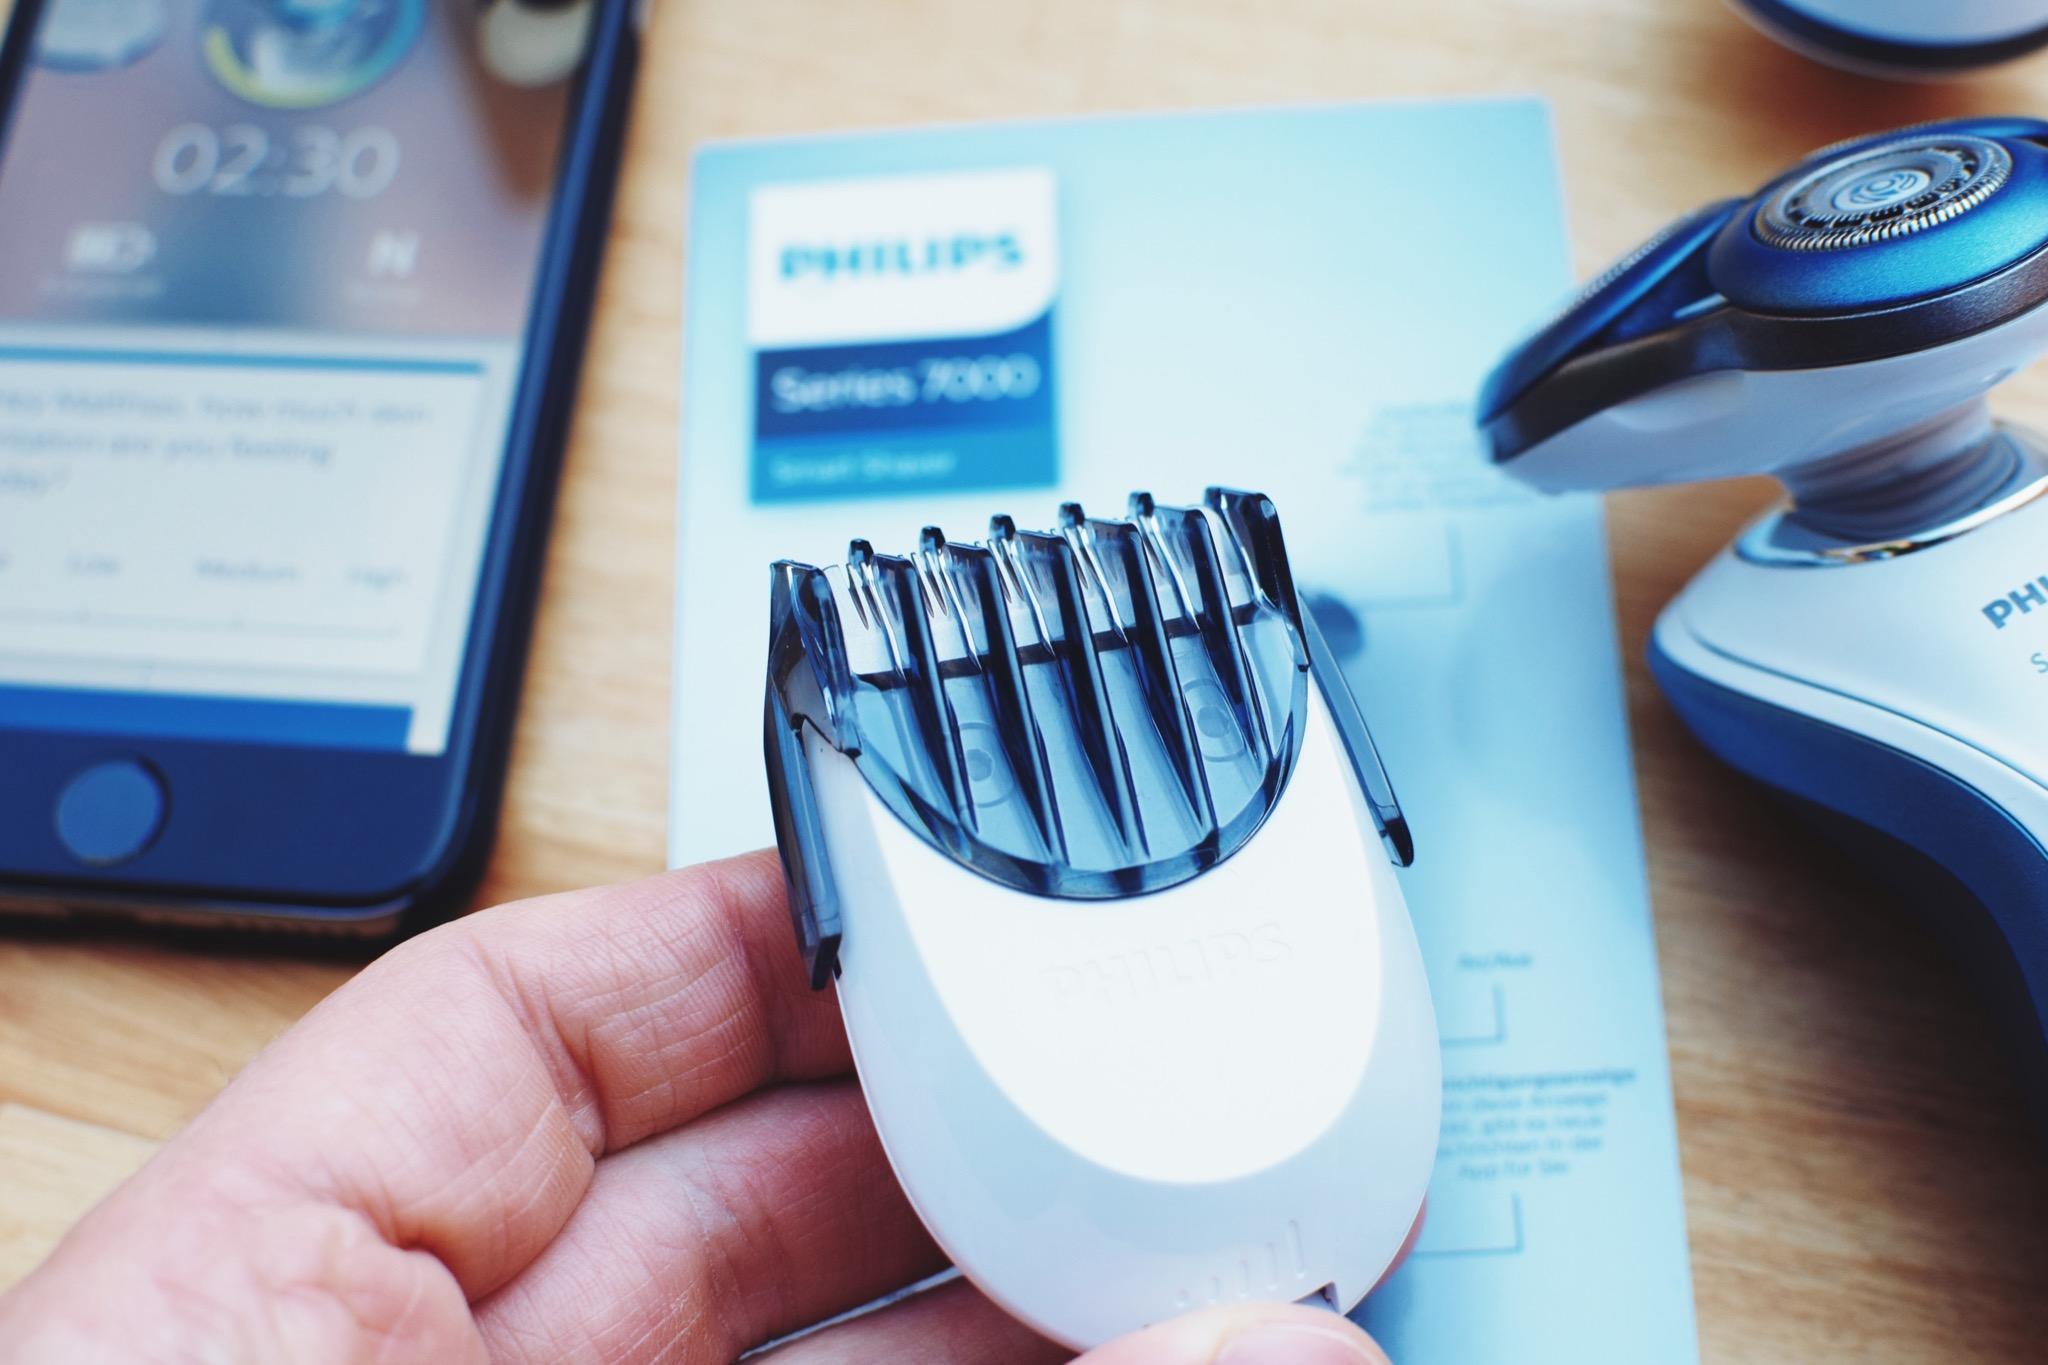 Philips Smart Shaver Series 7000 1